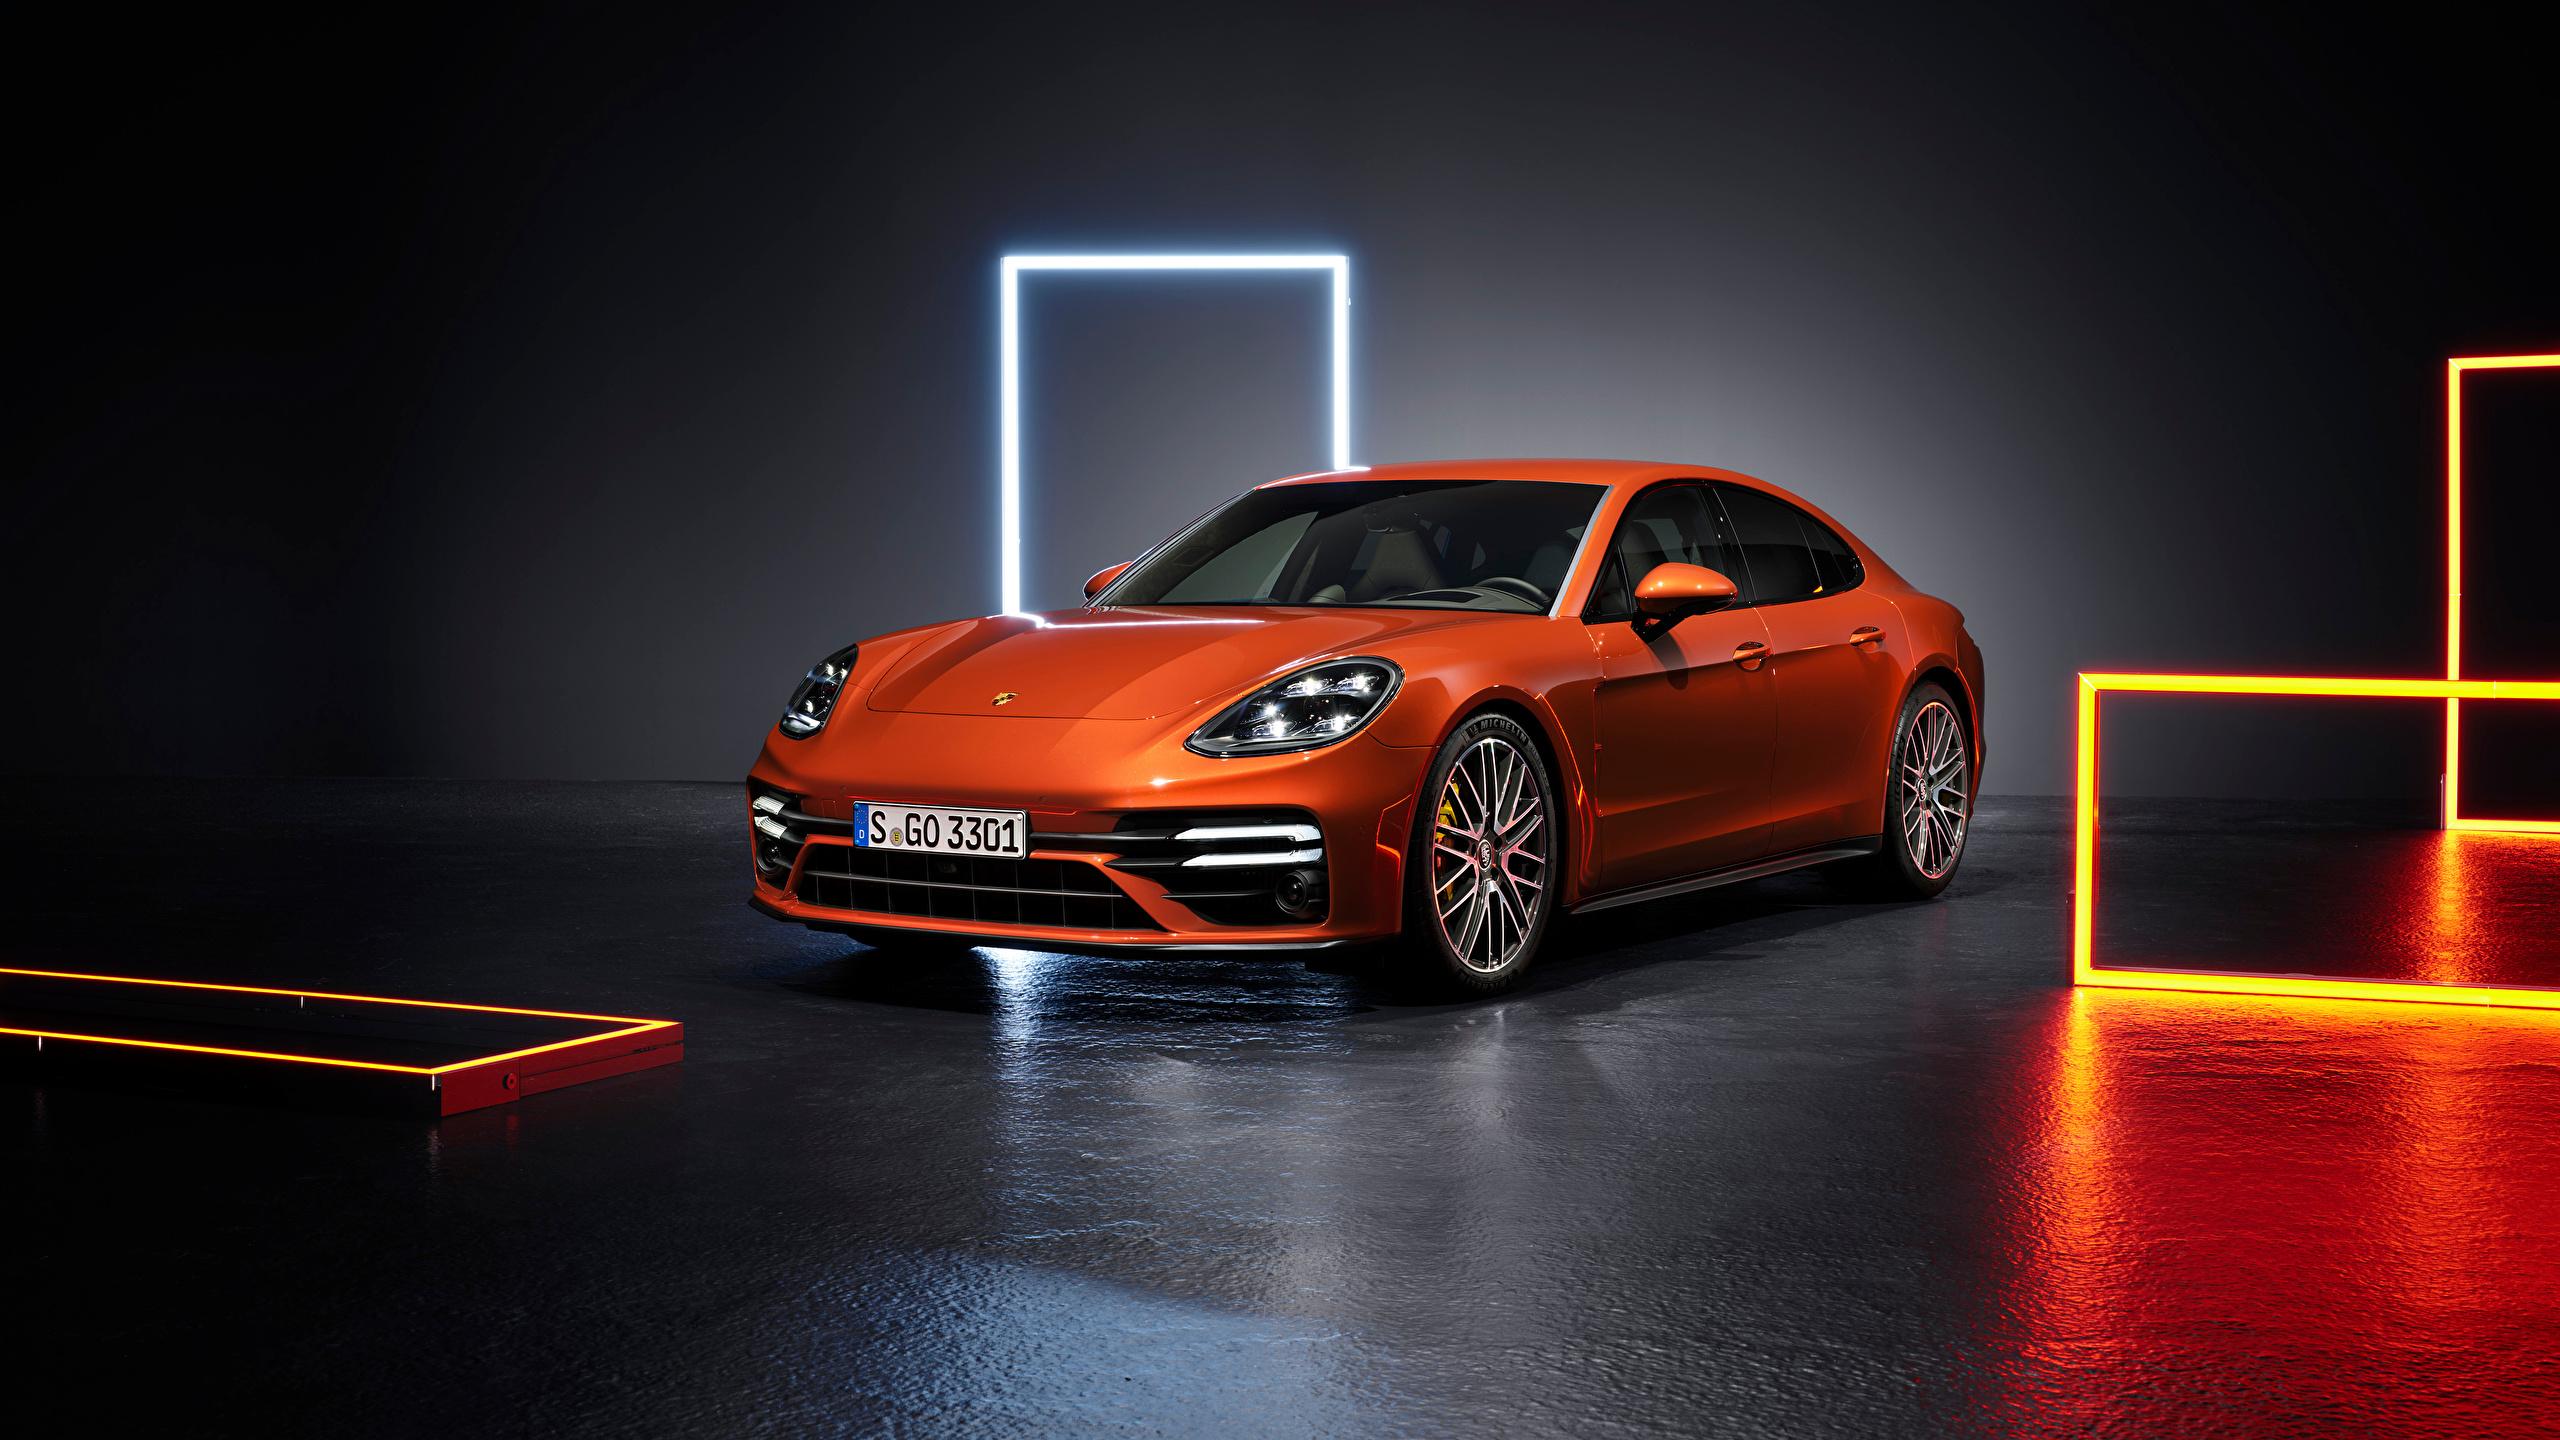 Фото Порше Panamera Turbo S (971), 2020 оранжевые машина Металлик 2560x1440 Porsche оранжевая Оранжевый оранжевых авто машины Автомобили автомобиль